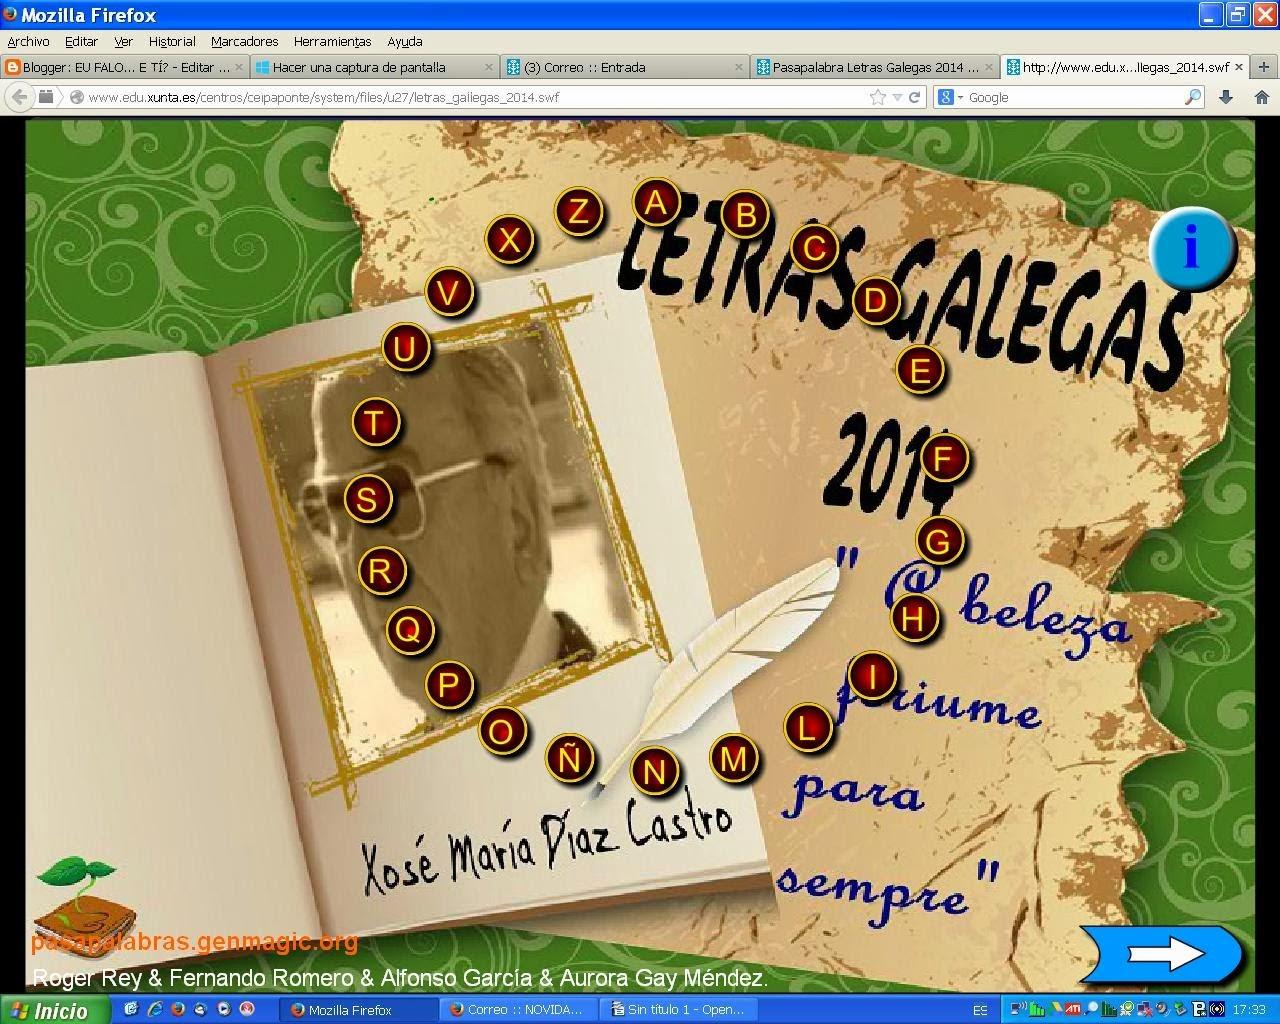 http://www.edu.xunta.es/centros/ceipaponte/system/files/u27/letras_gallegas_2014.swf